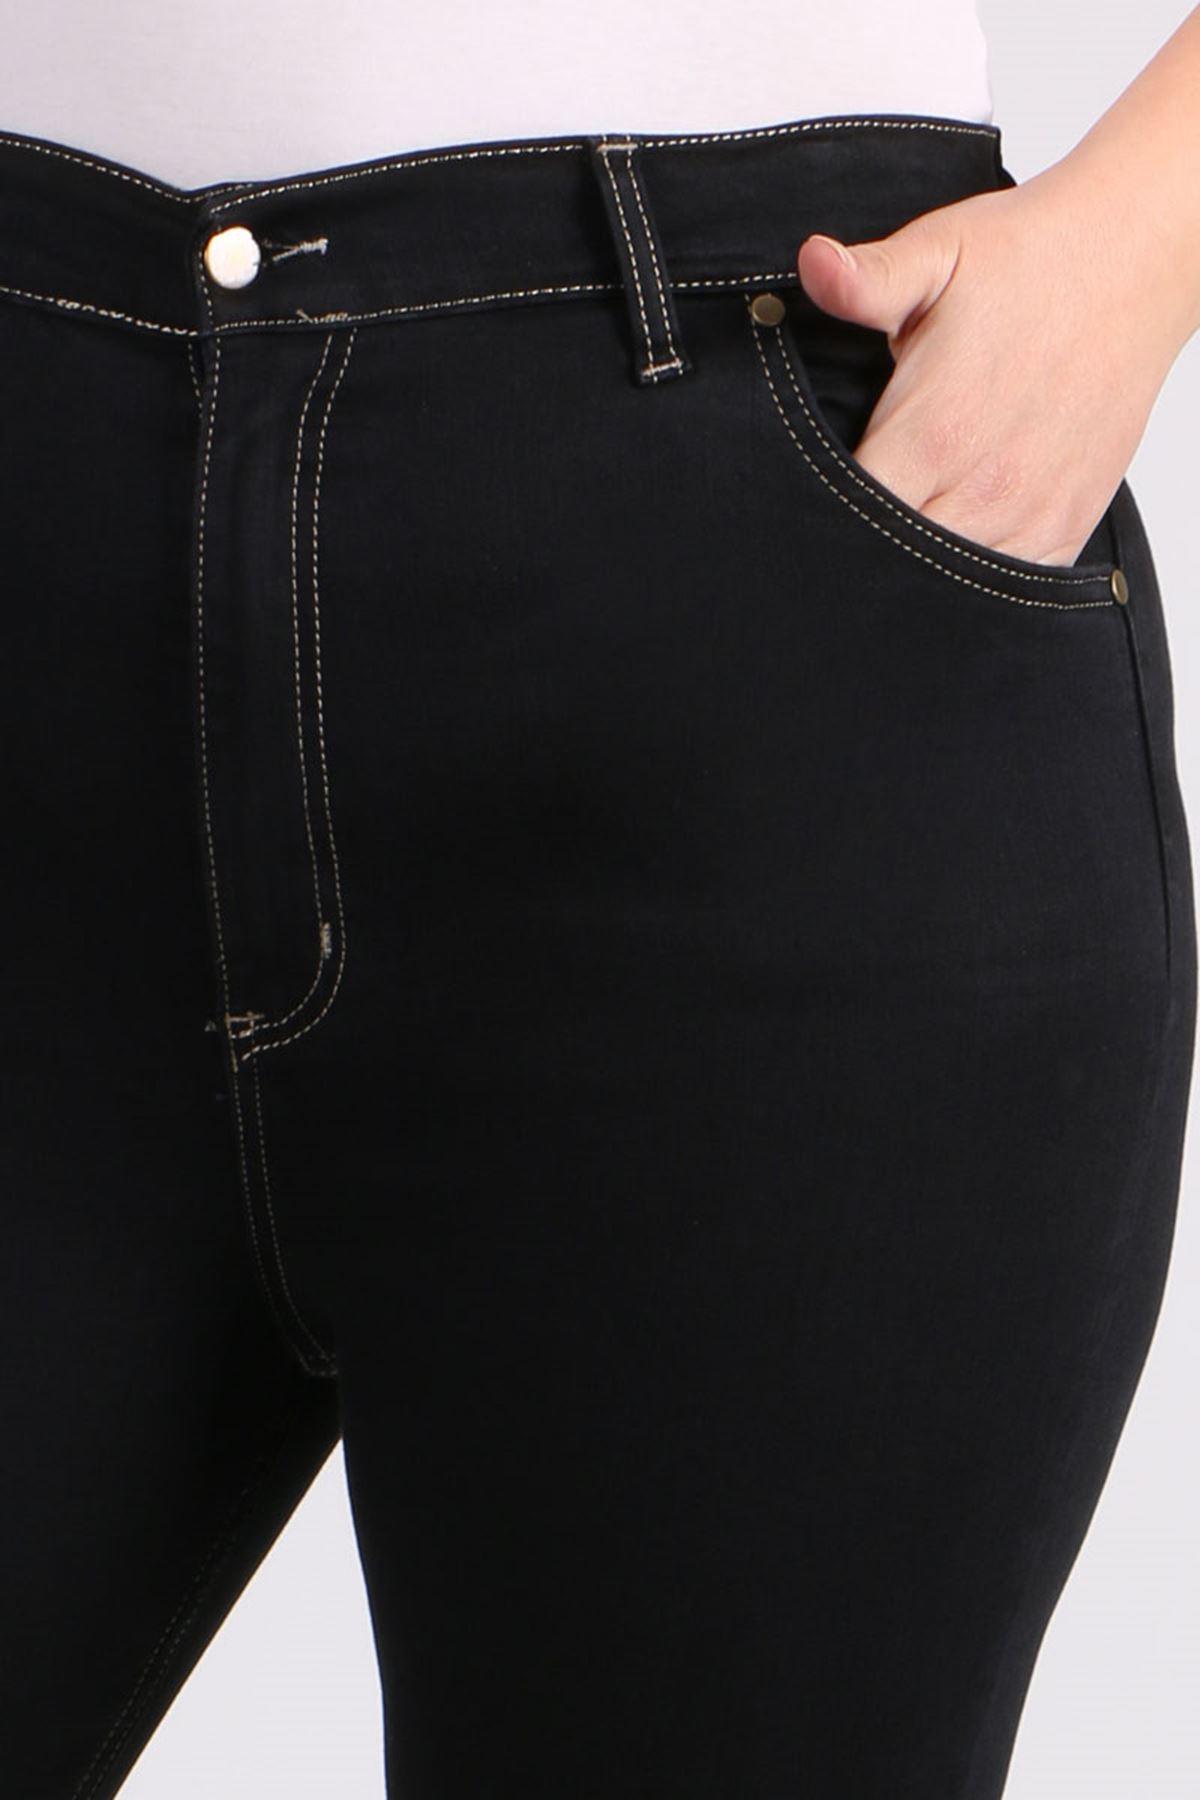 9107-1 Büyük Beden Dar Paça Kot Pantalon-Siyah